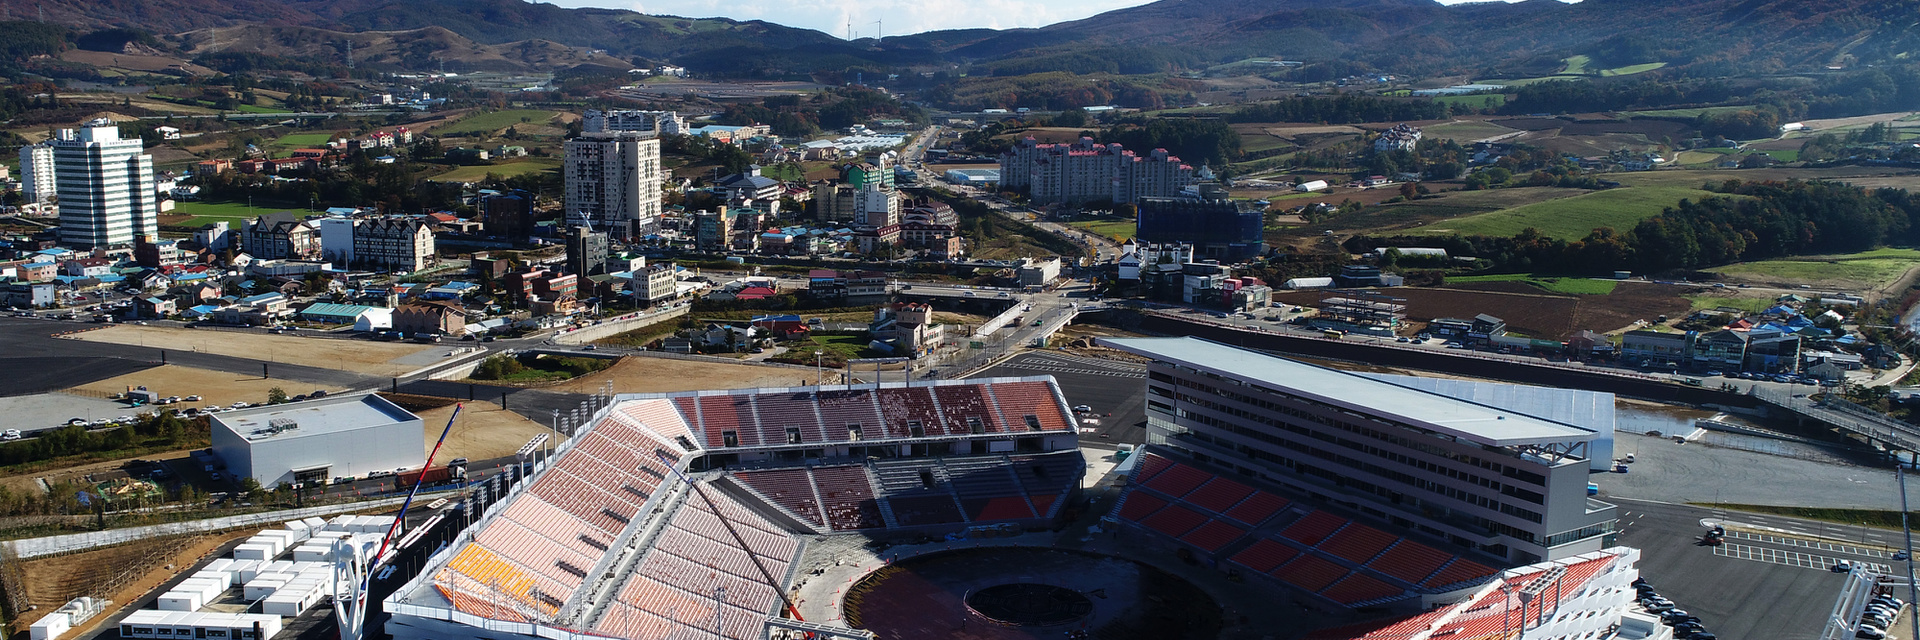 Phjongcshang Olympic Stadium